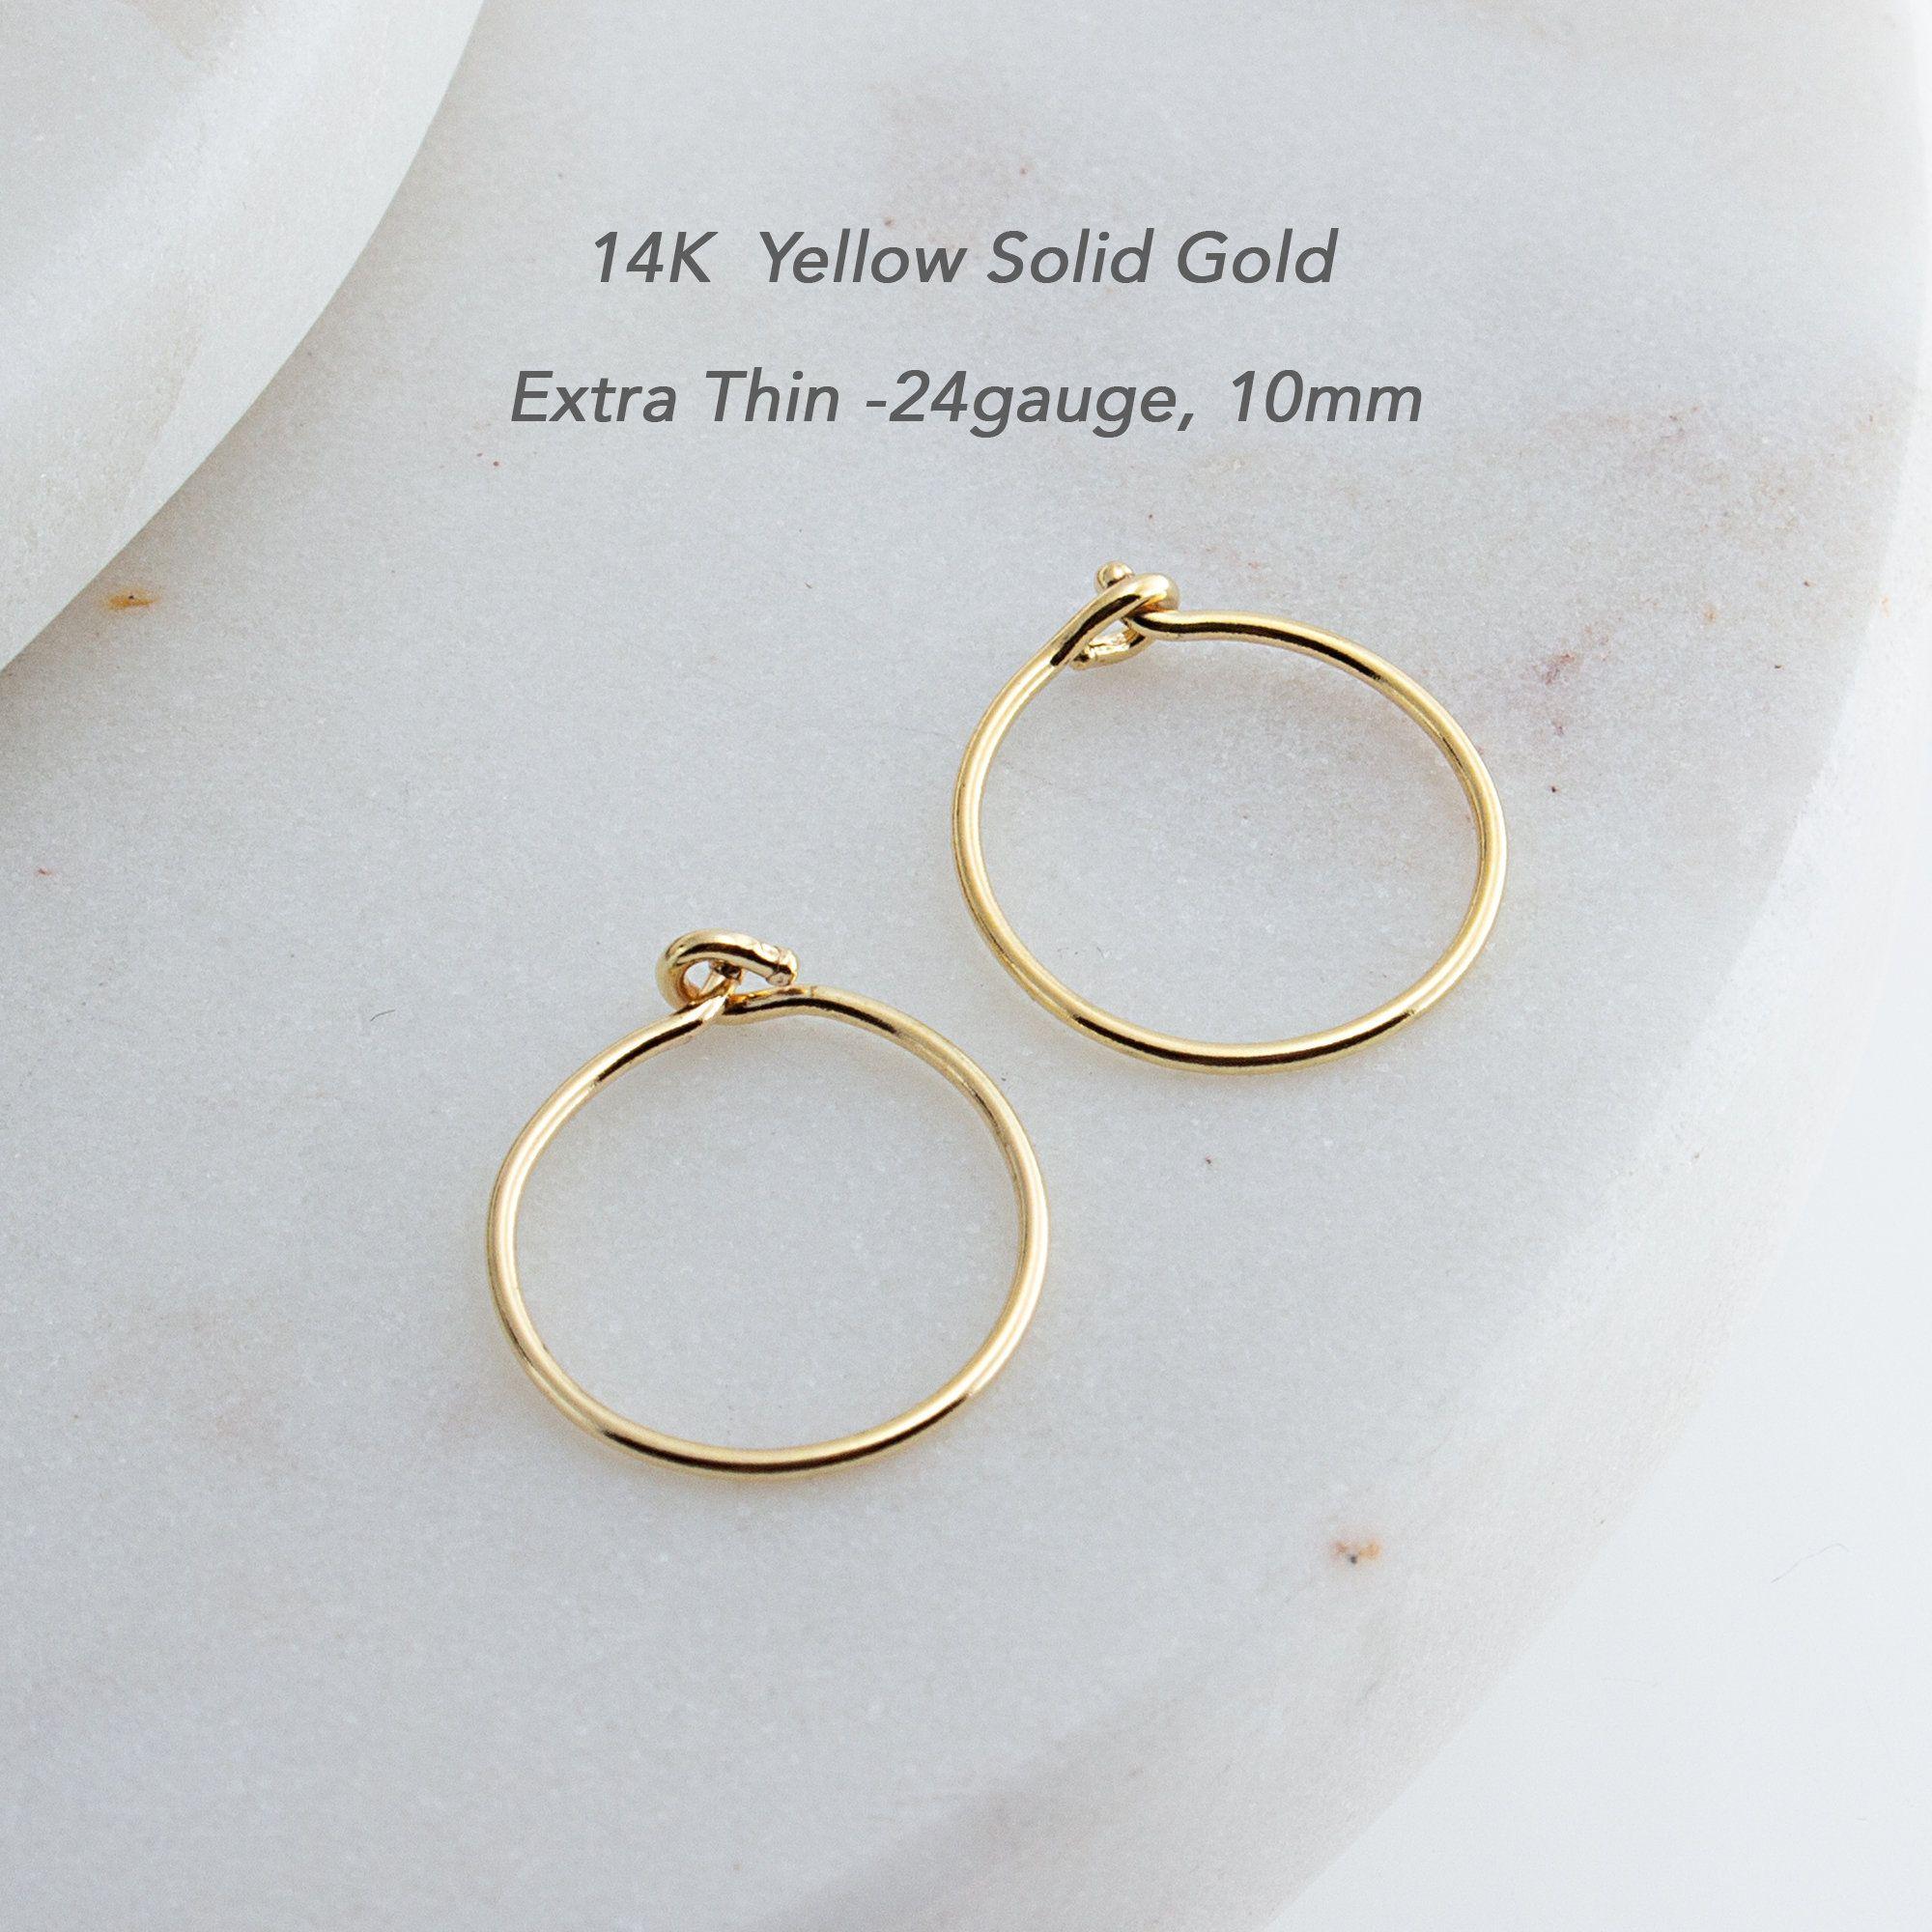 Solid 14k Gold Hoop Piercing 10mm Hugger Nostril Handmade Sold In